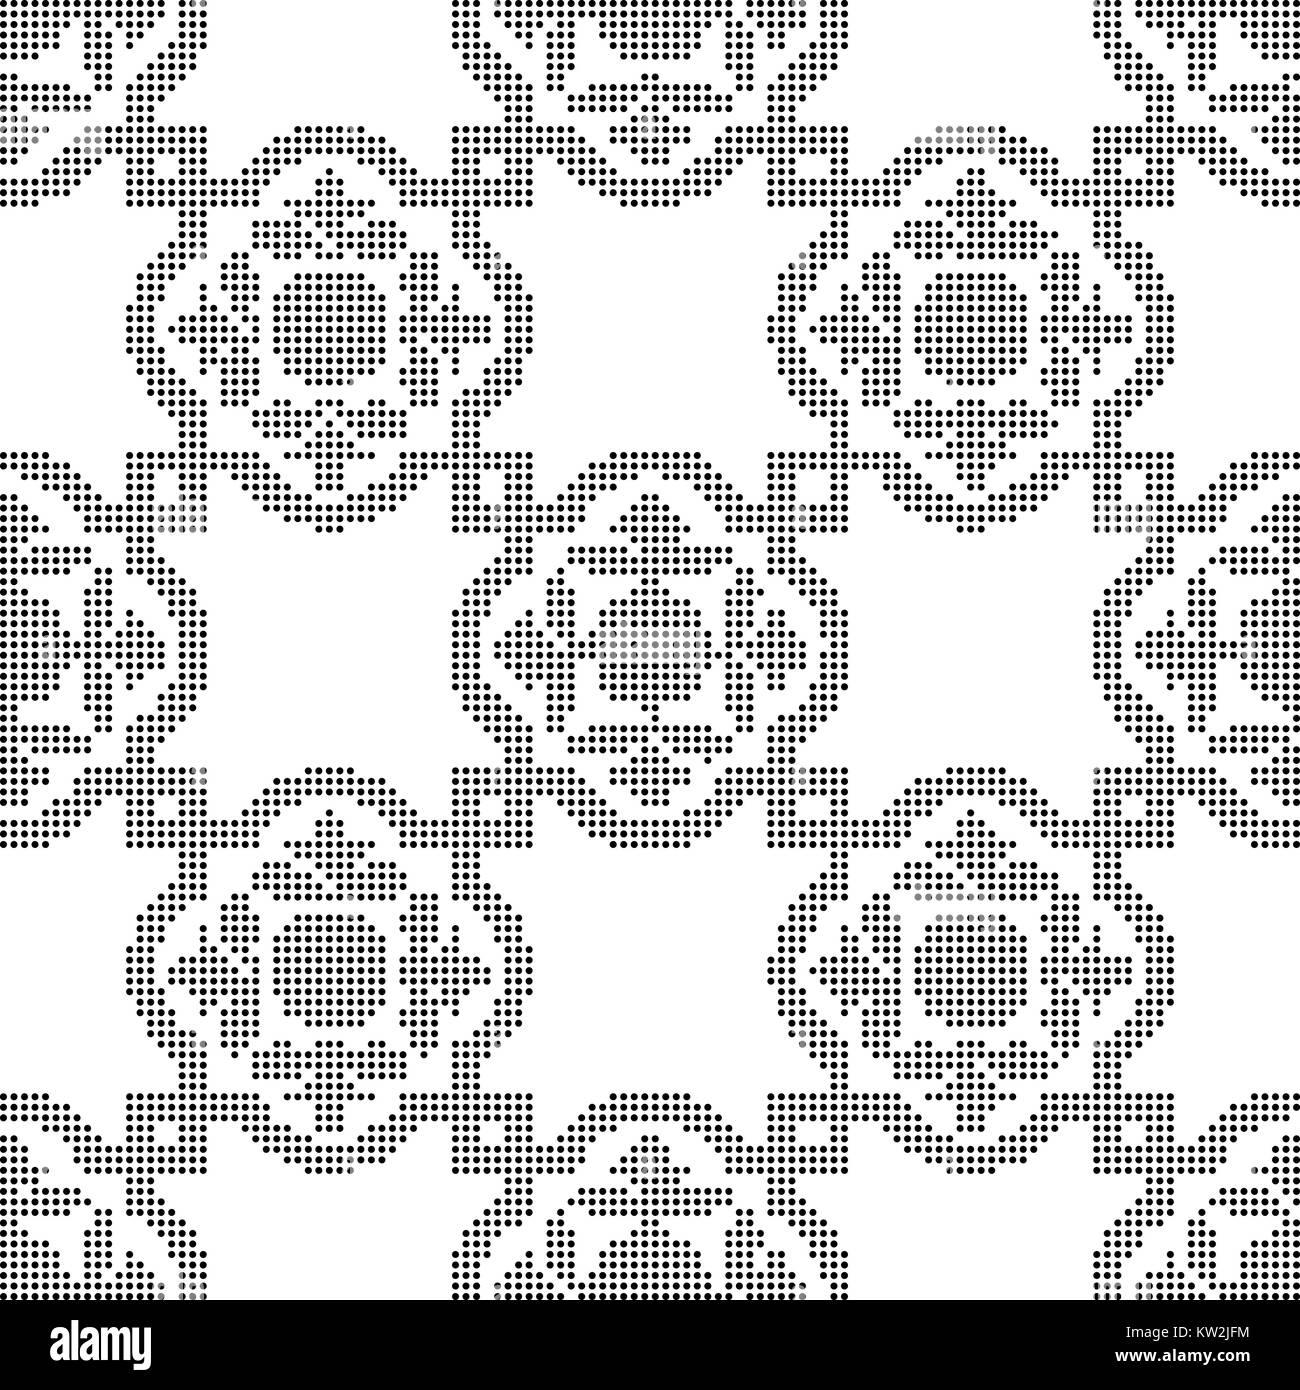 Beautiful Jfm Frames Frieze - Ideas de Marcos - lamegapromo.info